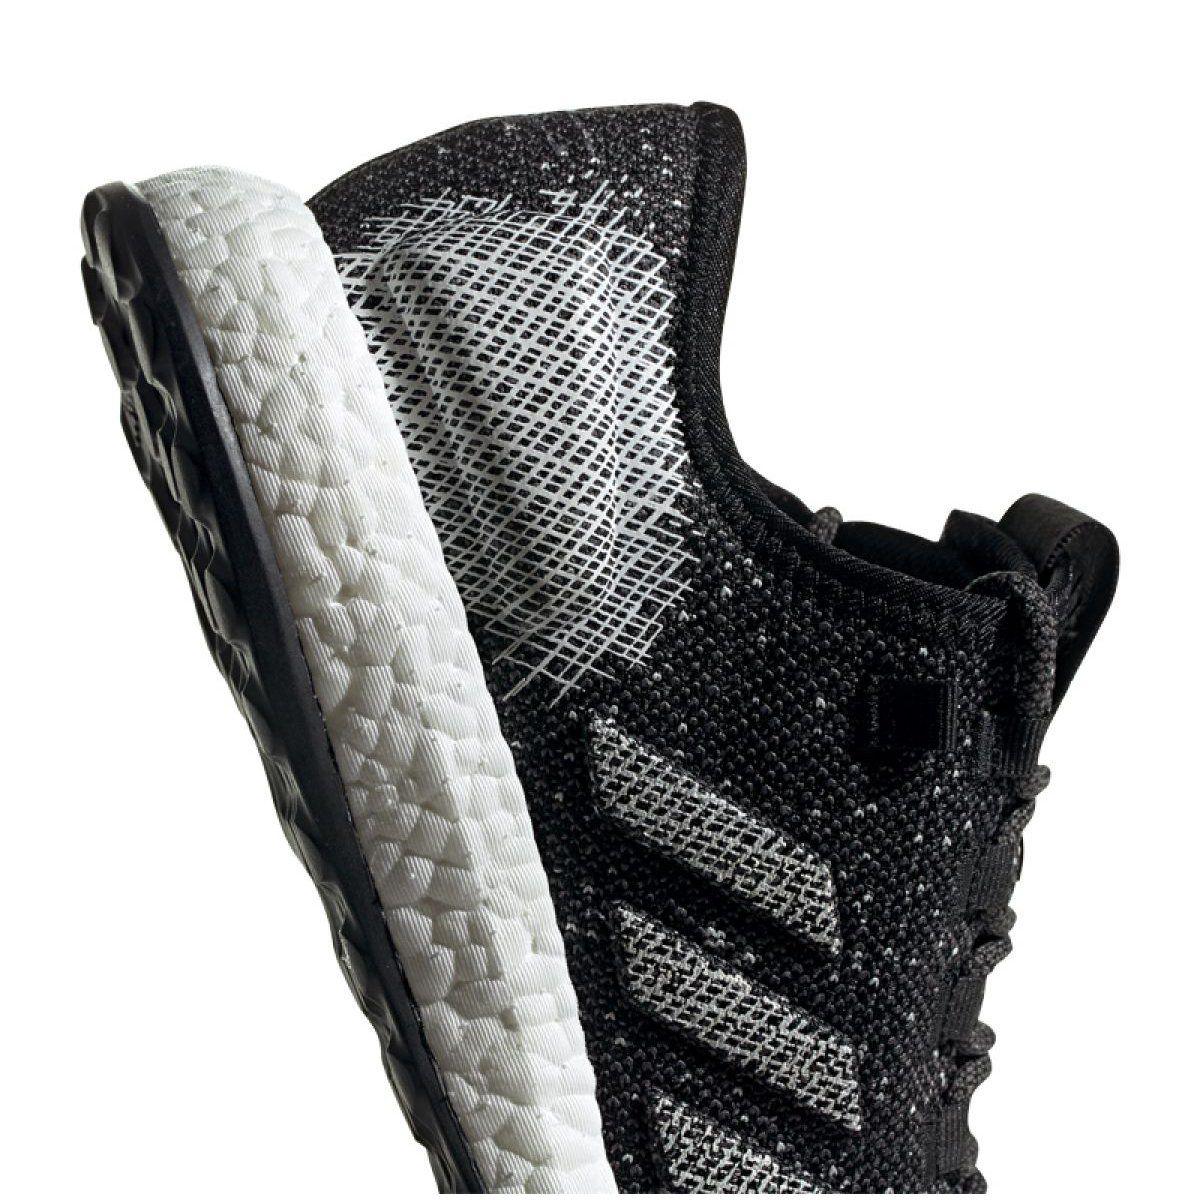 Buty Adidas Pureboost M B37775 Czarne Szare Adidas Pure Boost Pureboost Black Shoes